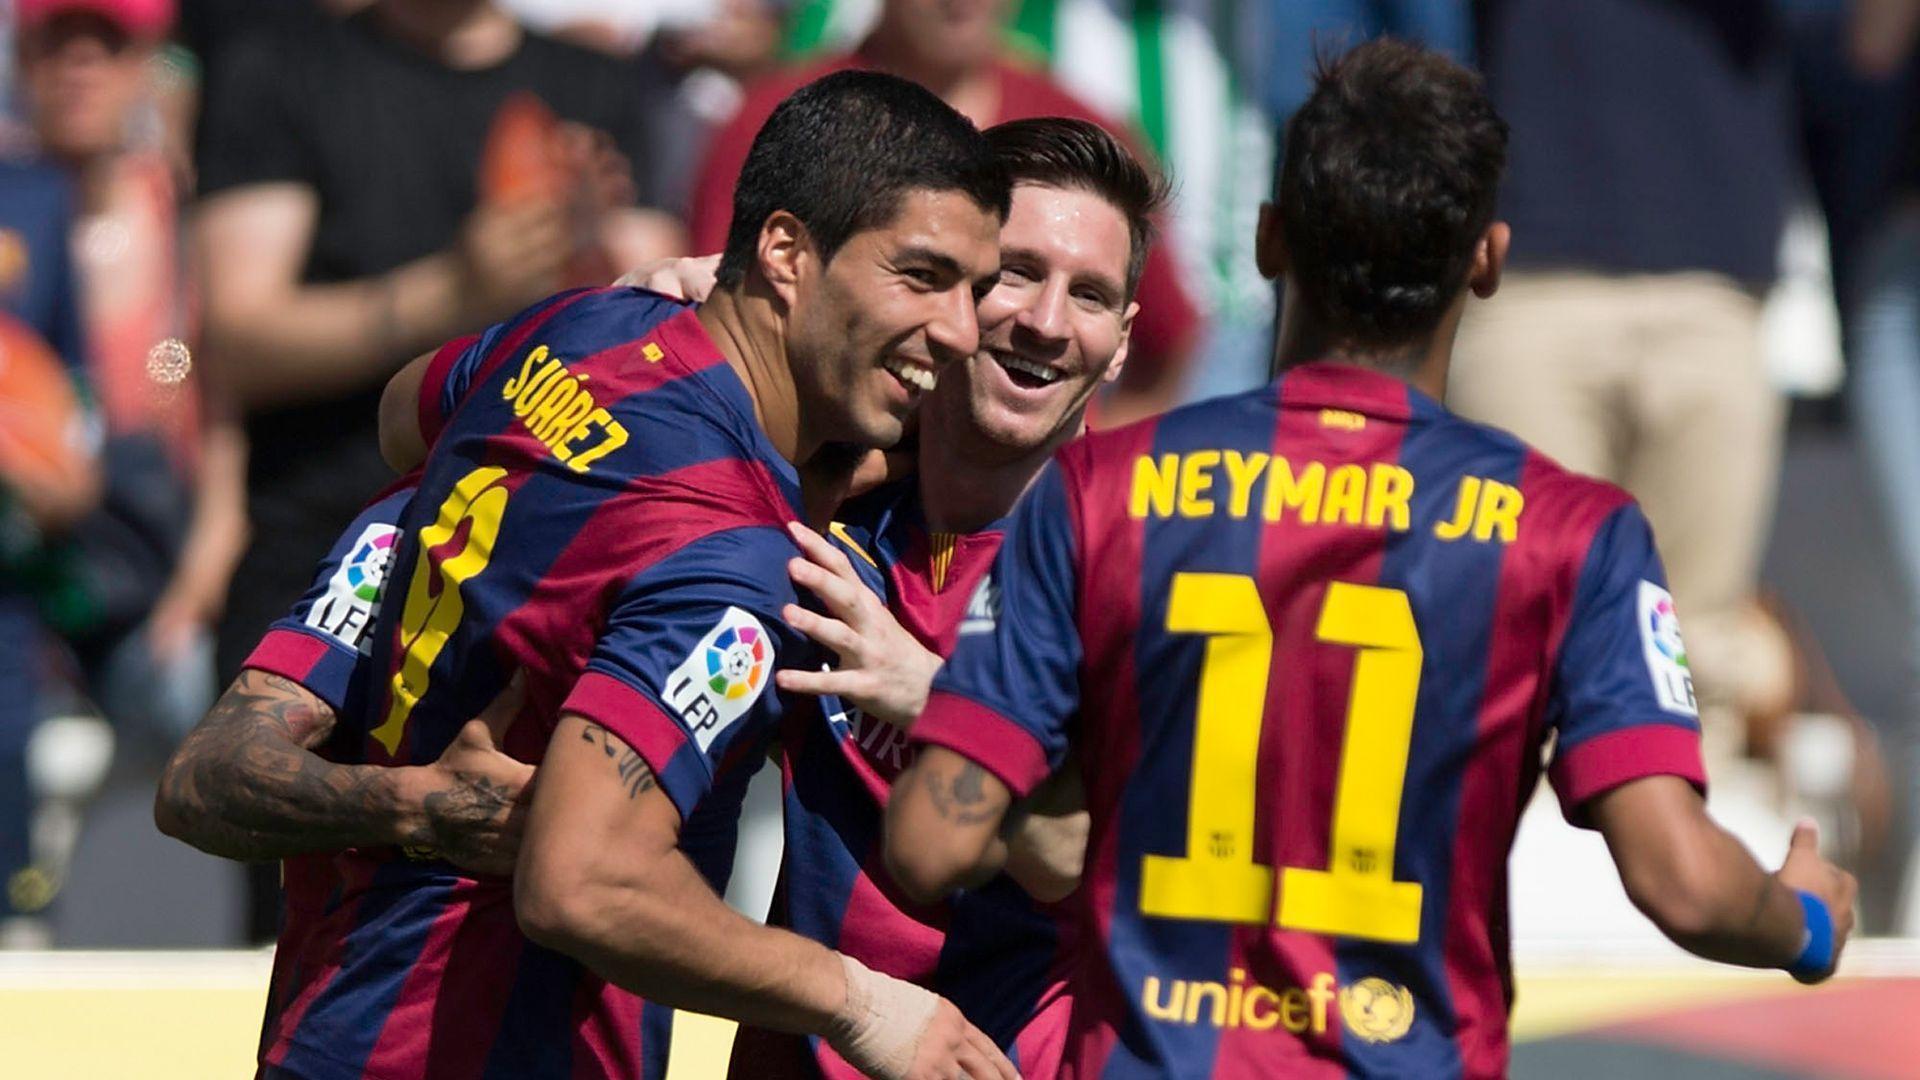 Msn Wallpaper Hd Msn Messi Neymar Suarez Wallpapers Wallpaper Cave